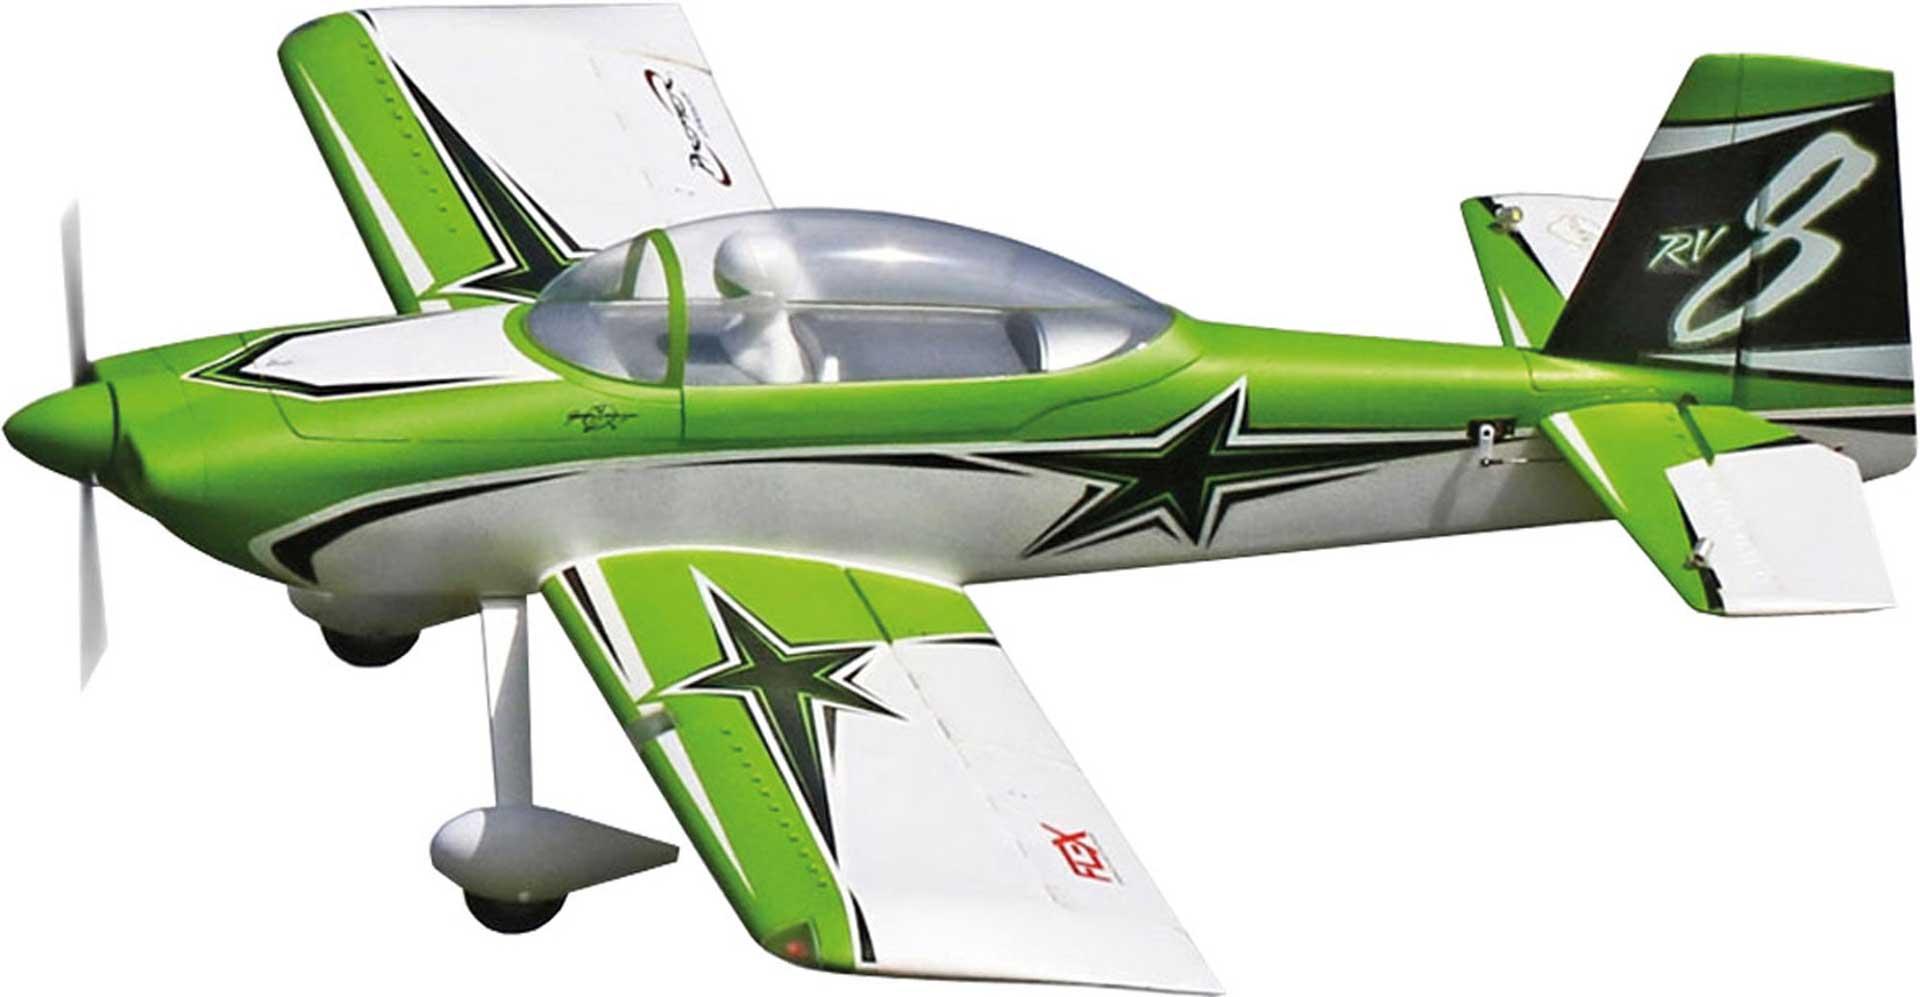 PREMIER AIRCRAFT RV-8 SUPER PNP MIT AURA 8 GRÜN